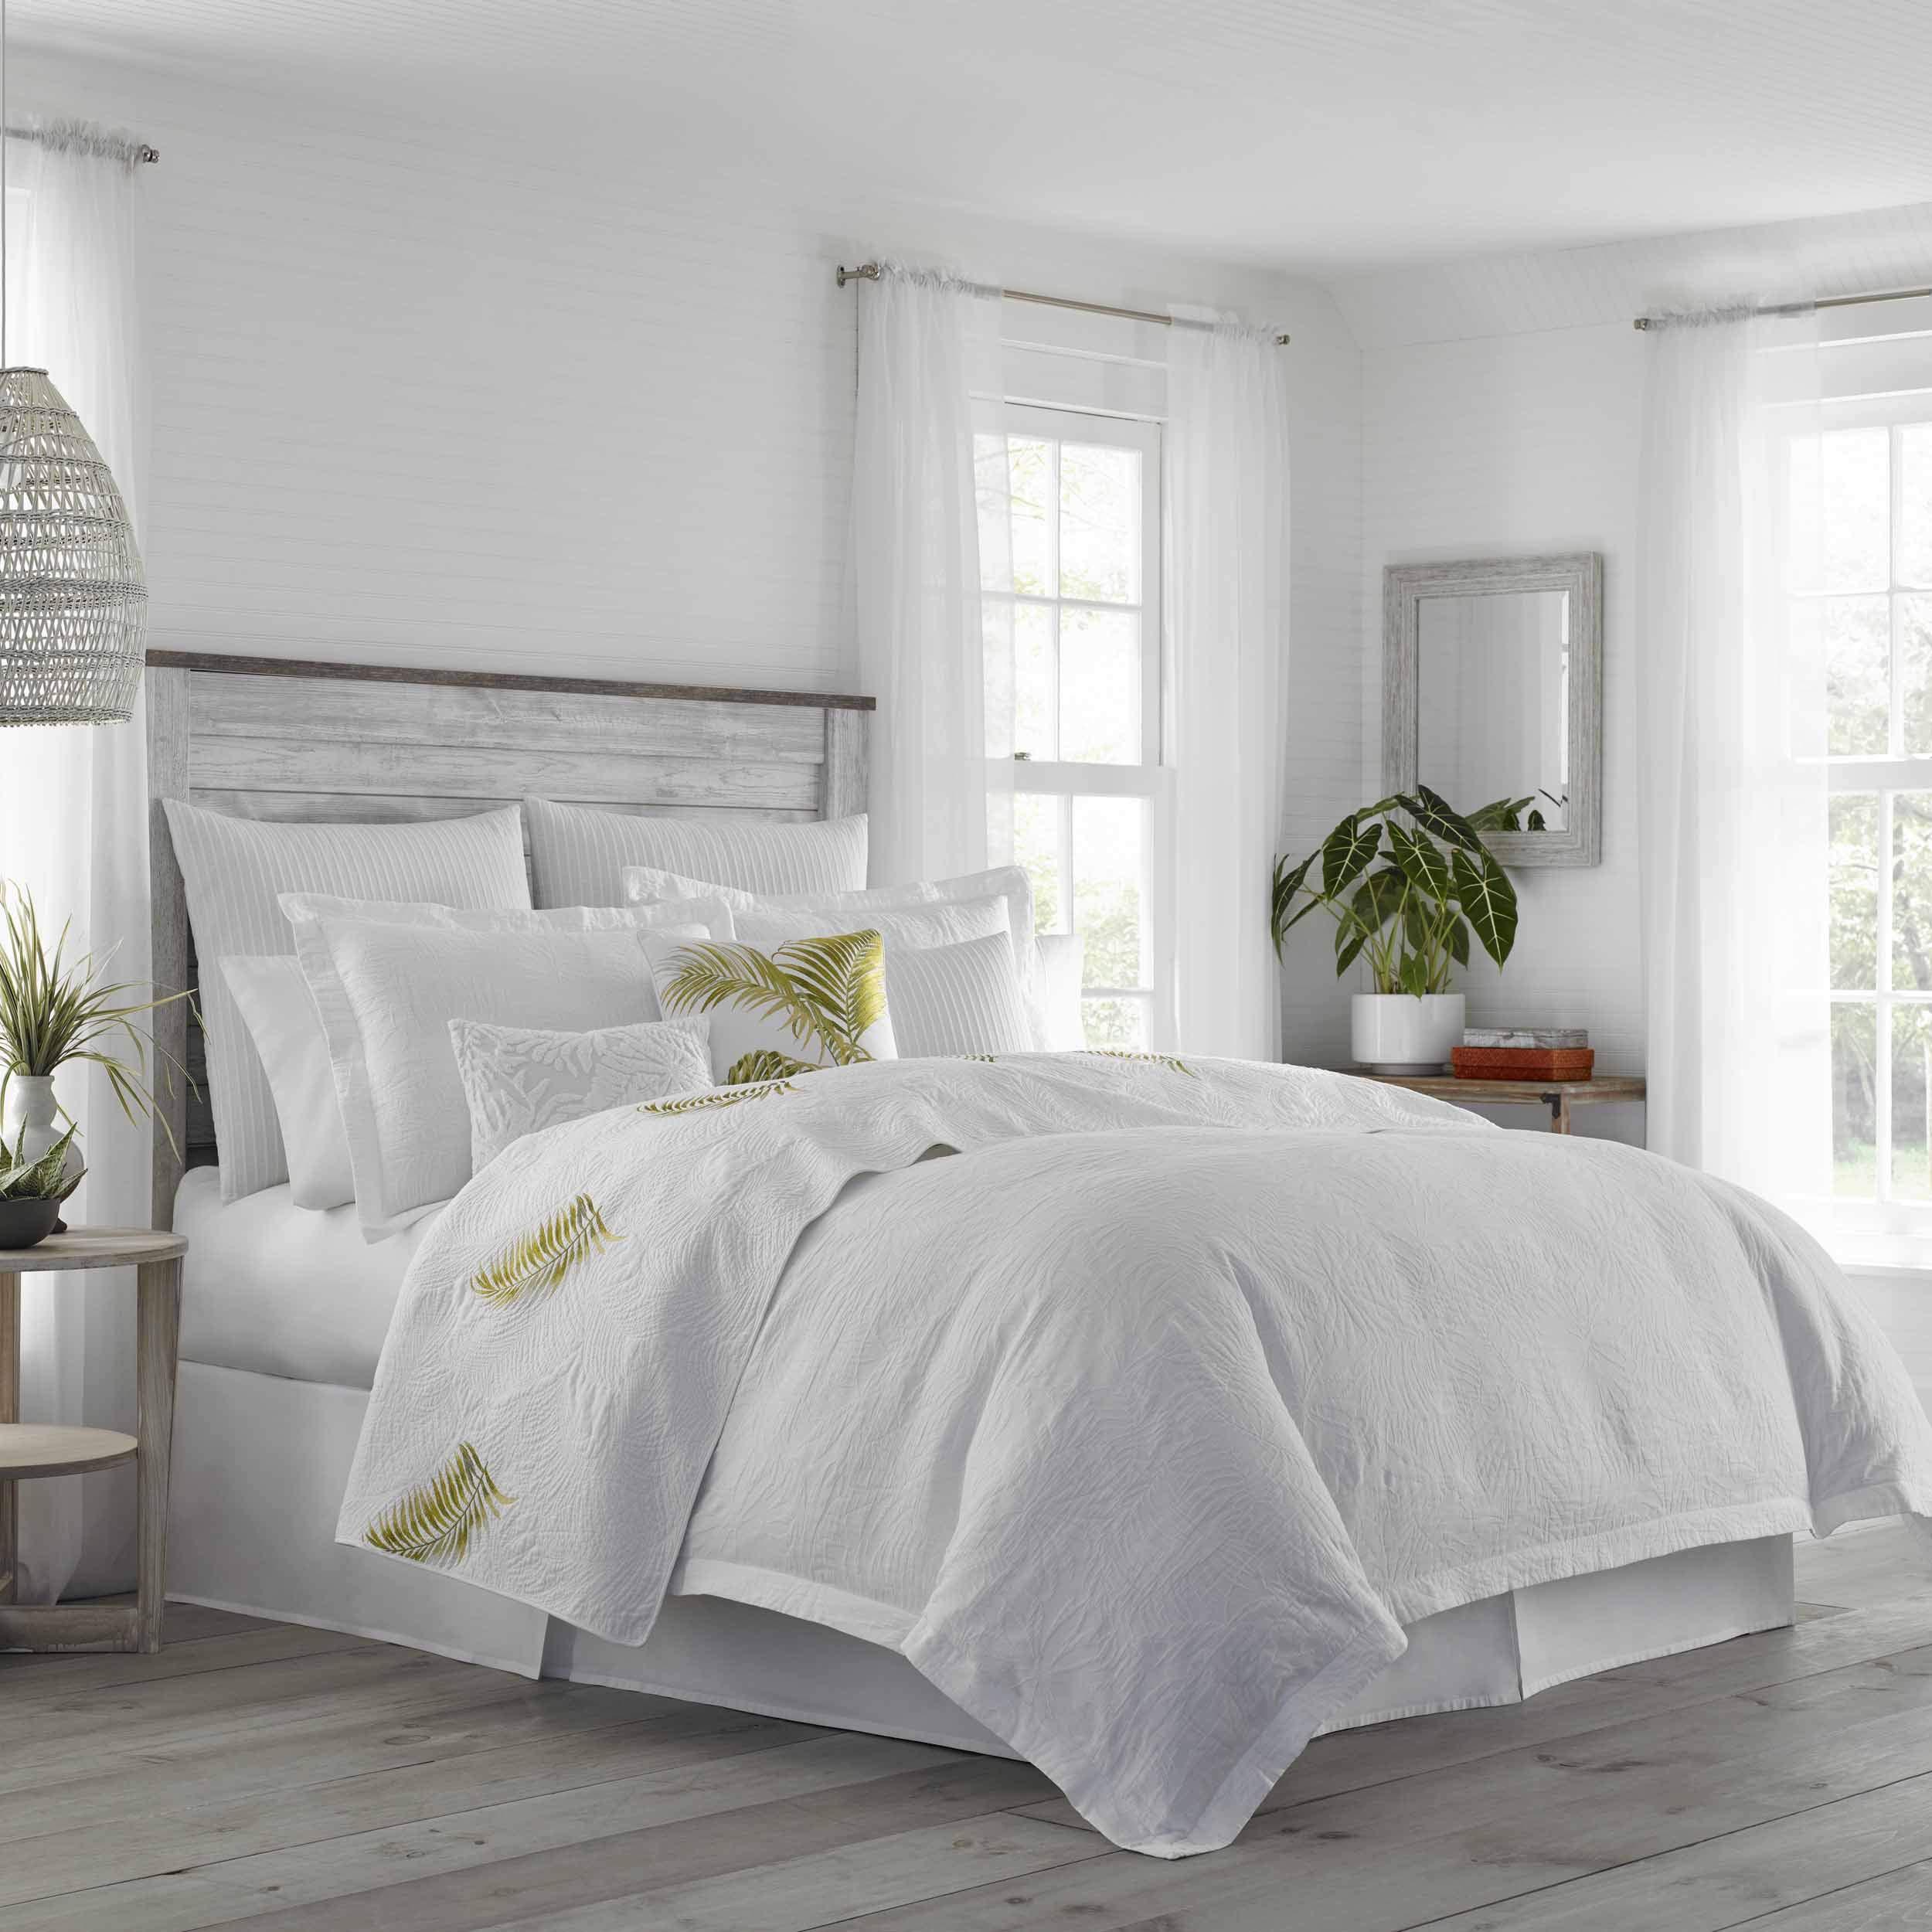 Tommy Bahama St Armands Comforter Set King, White